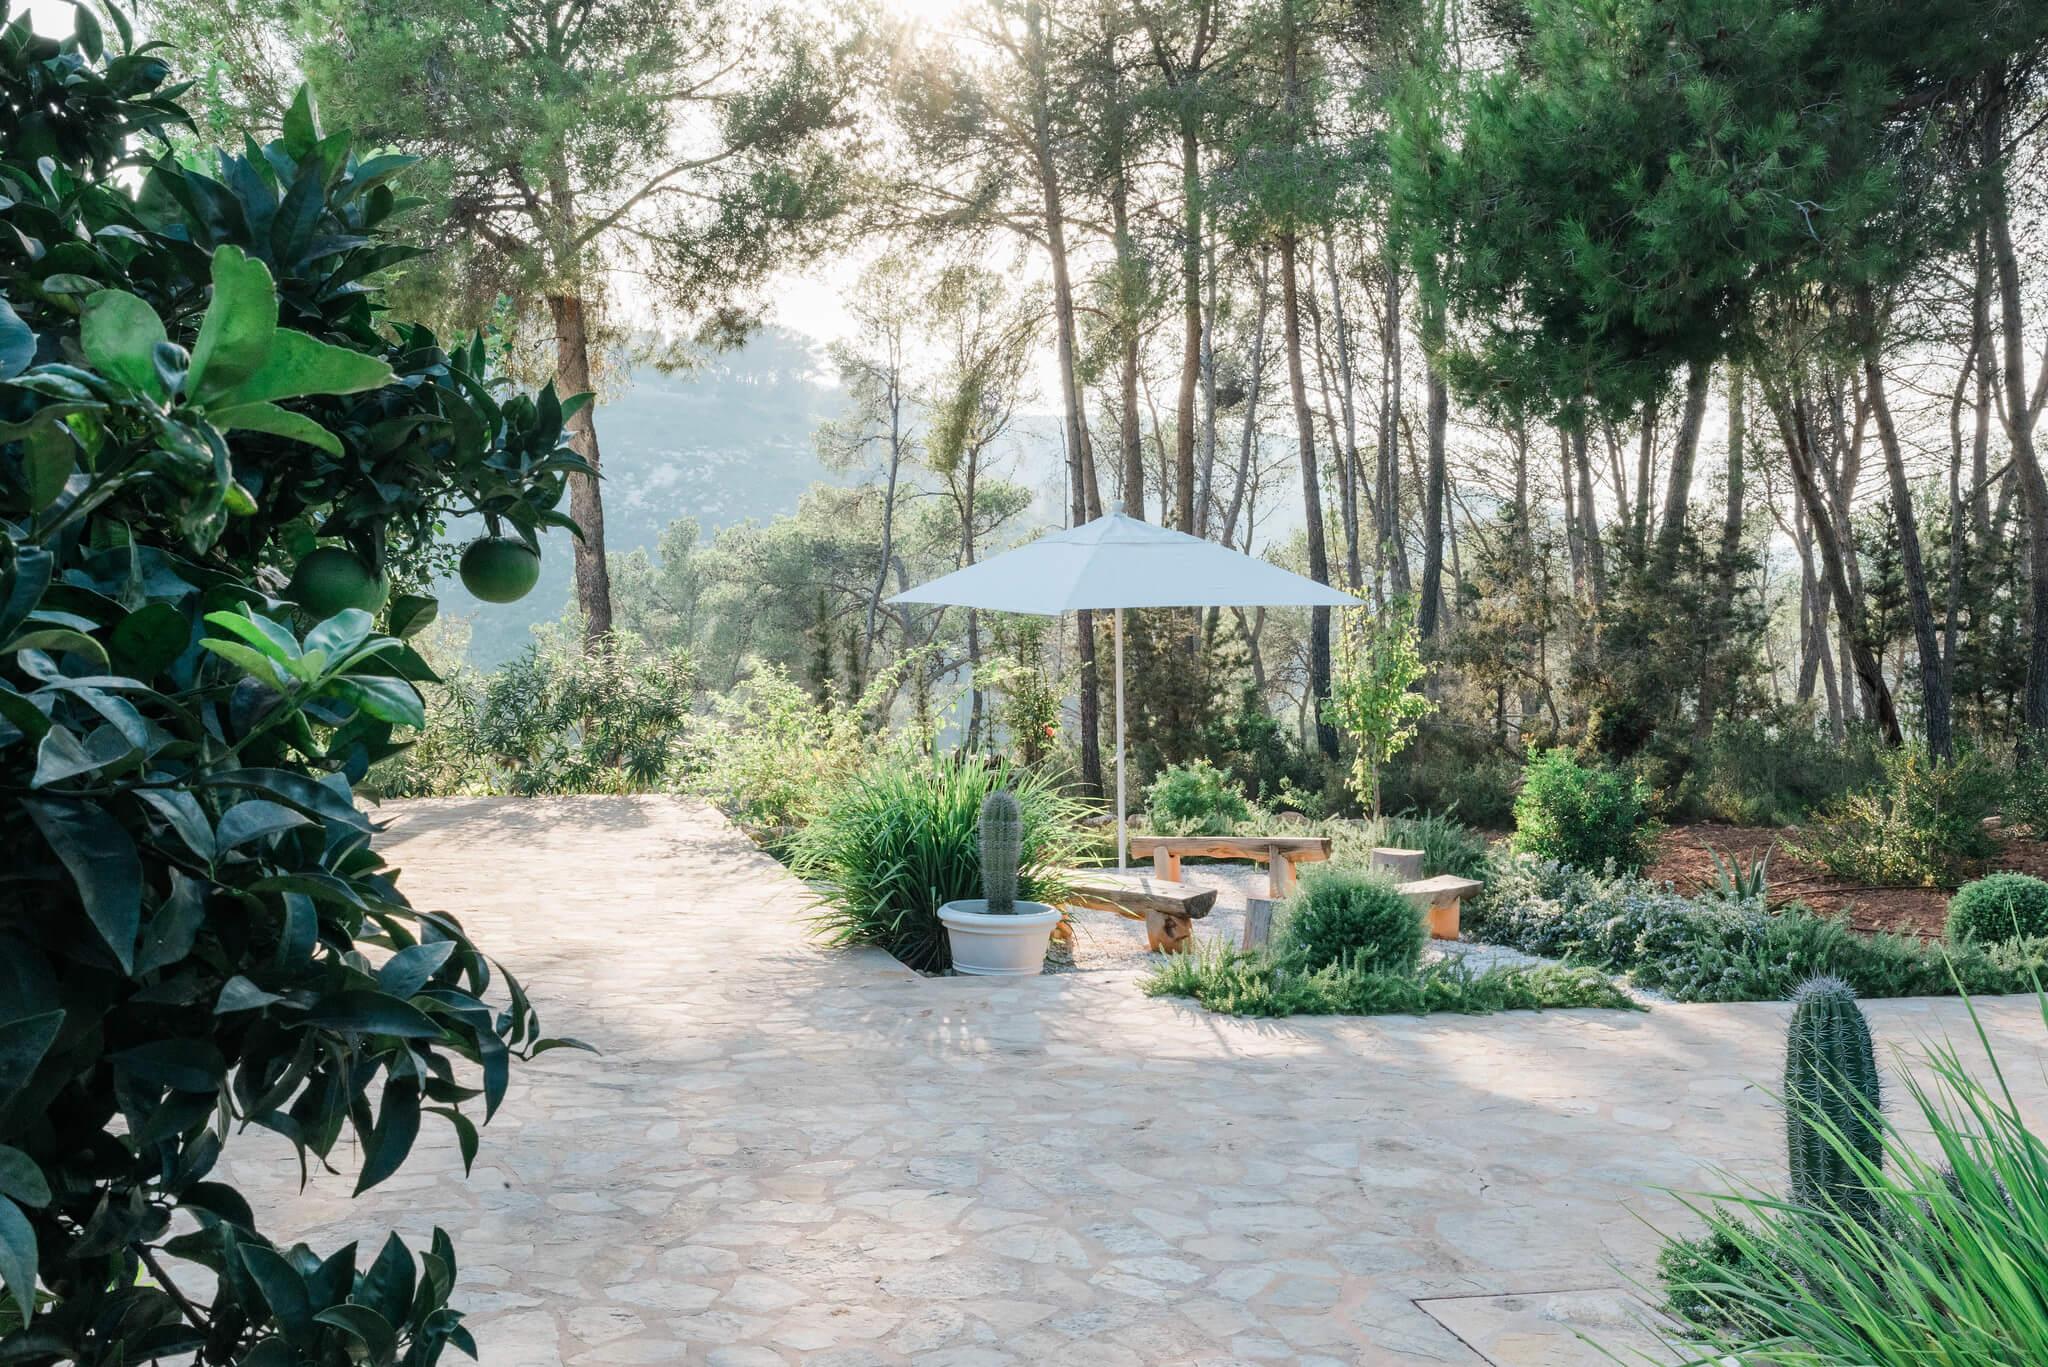 https://www.white-ibiza.com/wp-content/uploads/2020/05/white-ibiza-villas-can-terra-dappled-sunlight.jpg